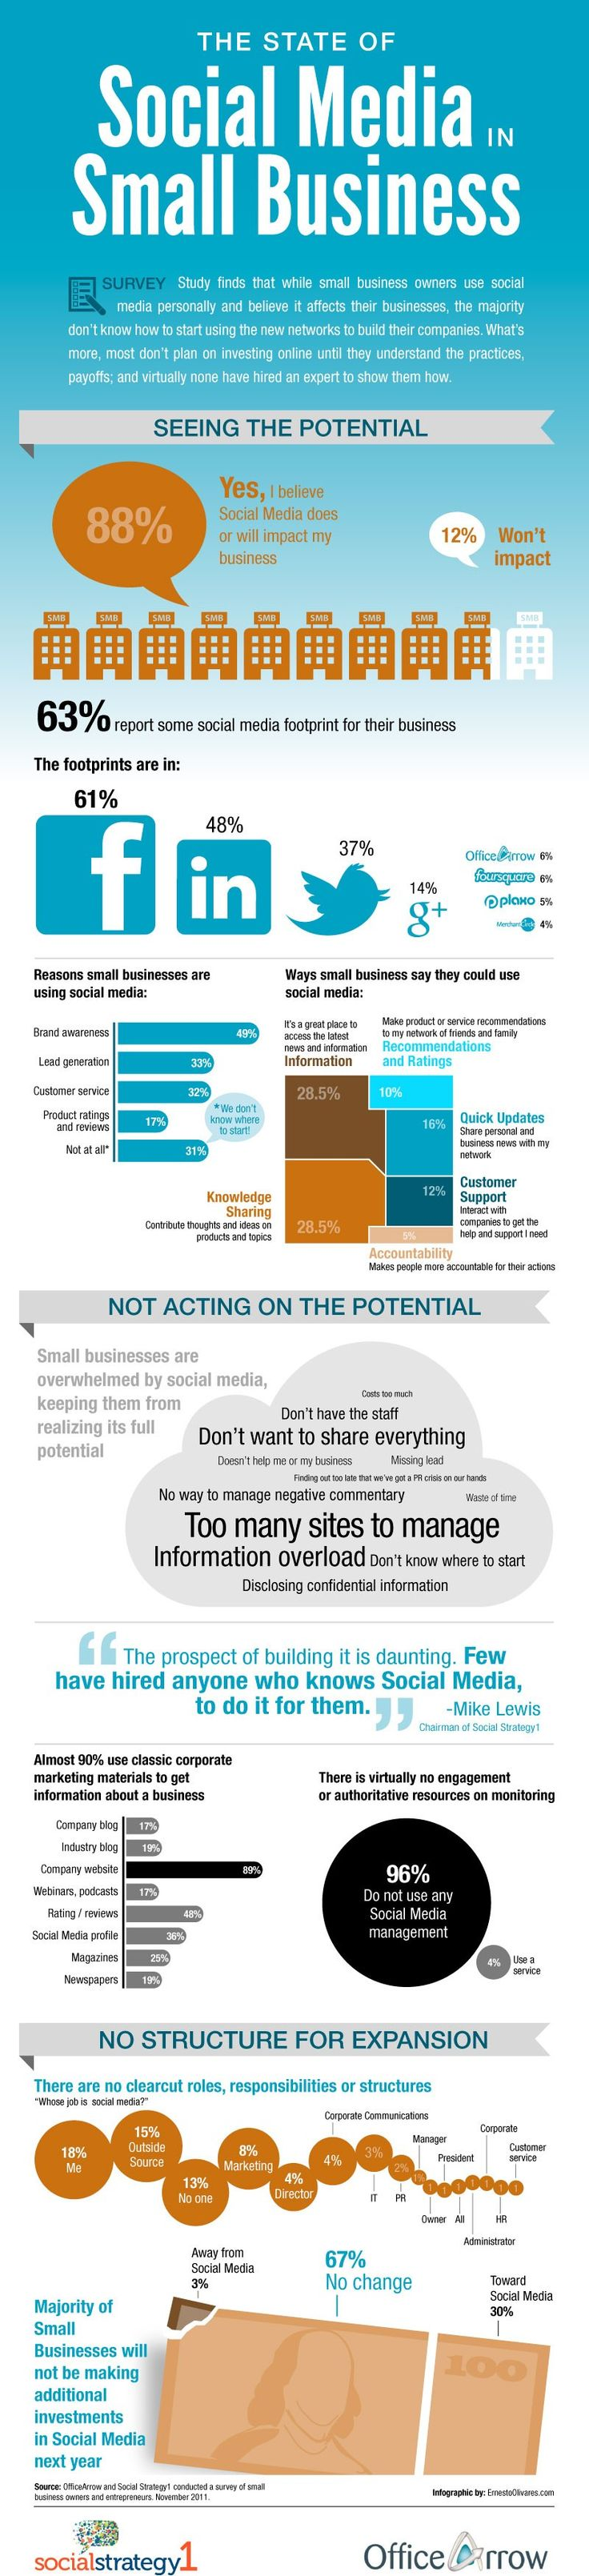 85 best Business ideas images on Pinterest   Business ideas ...